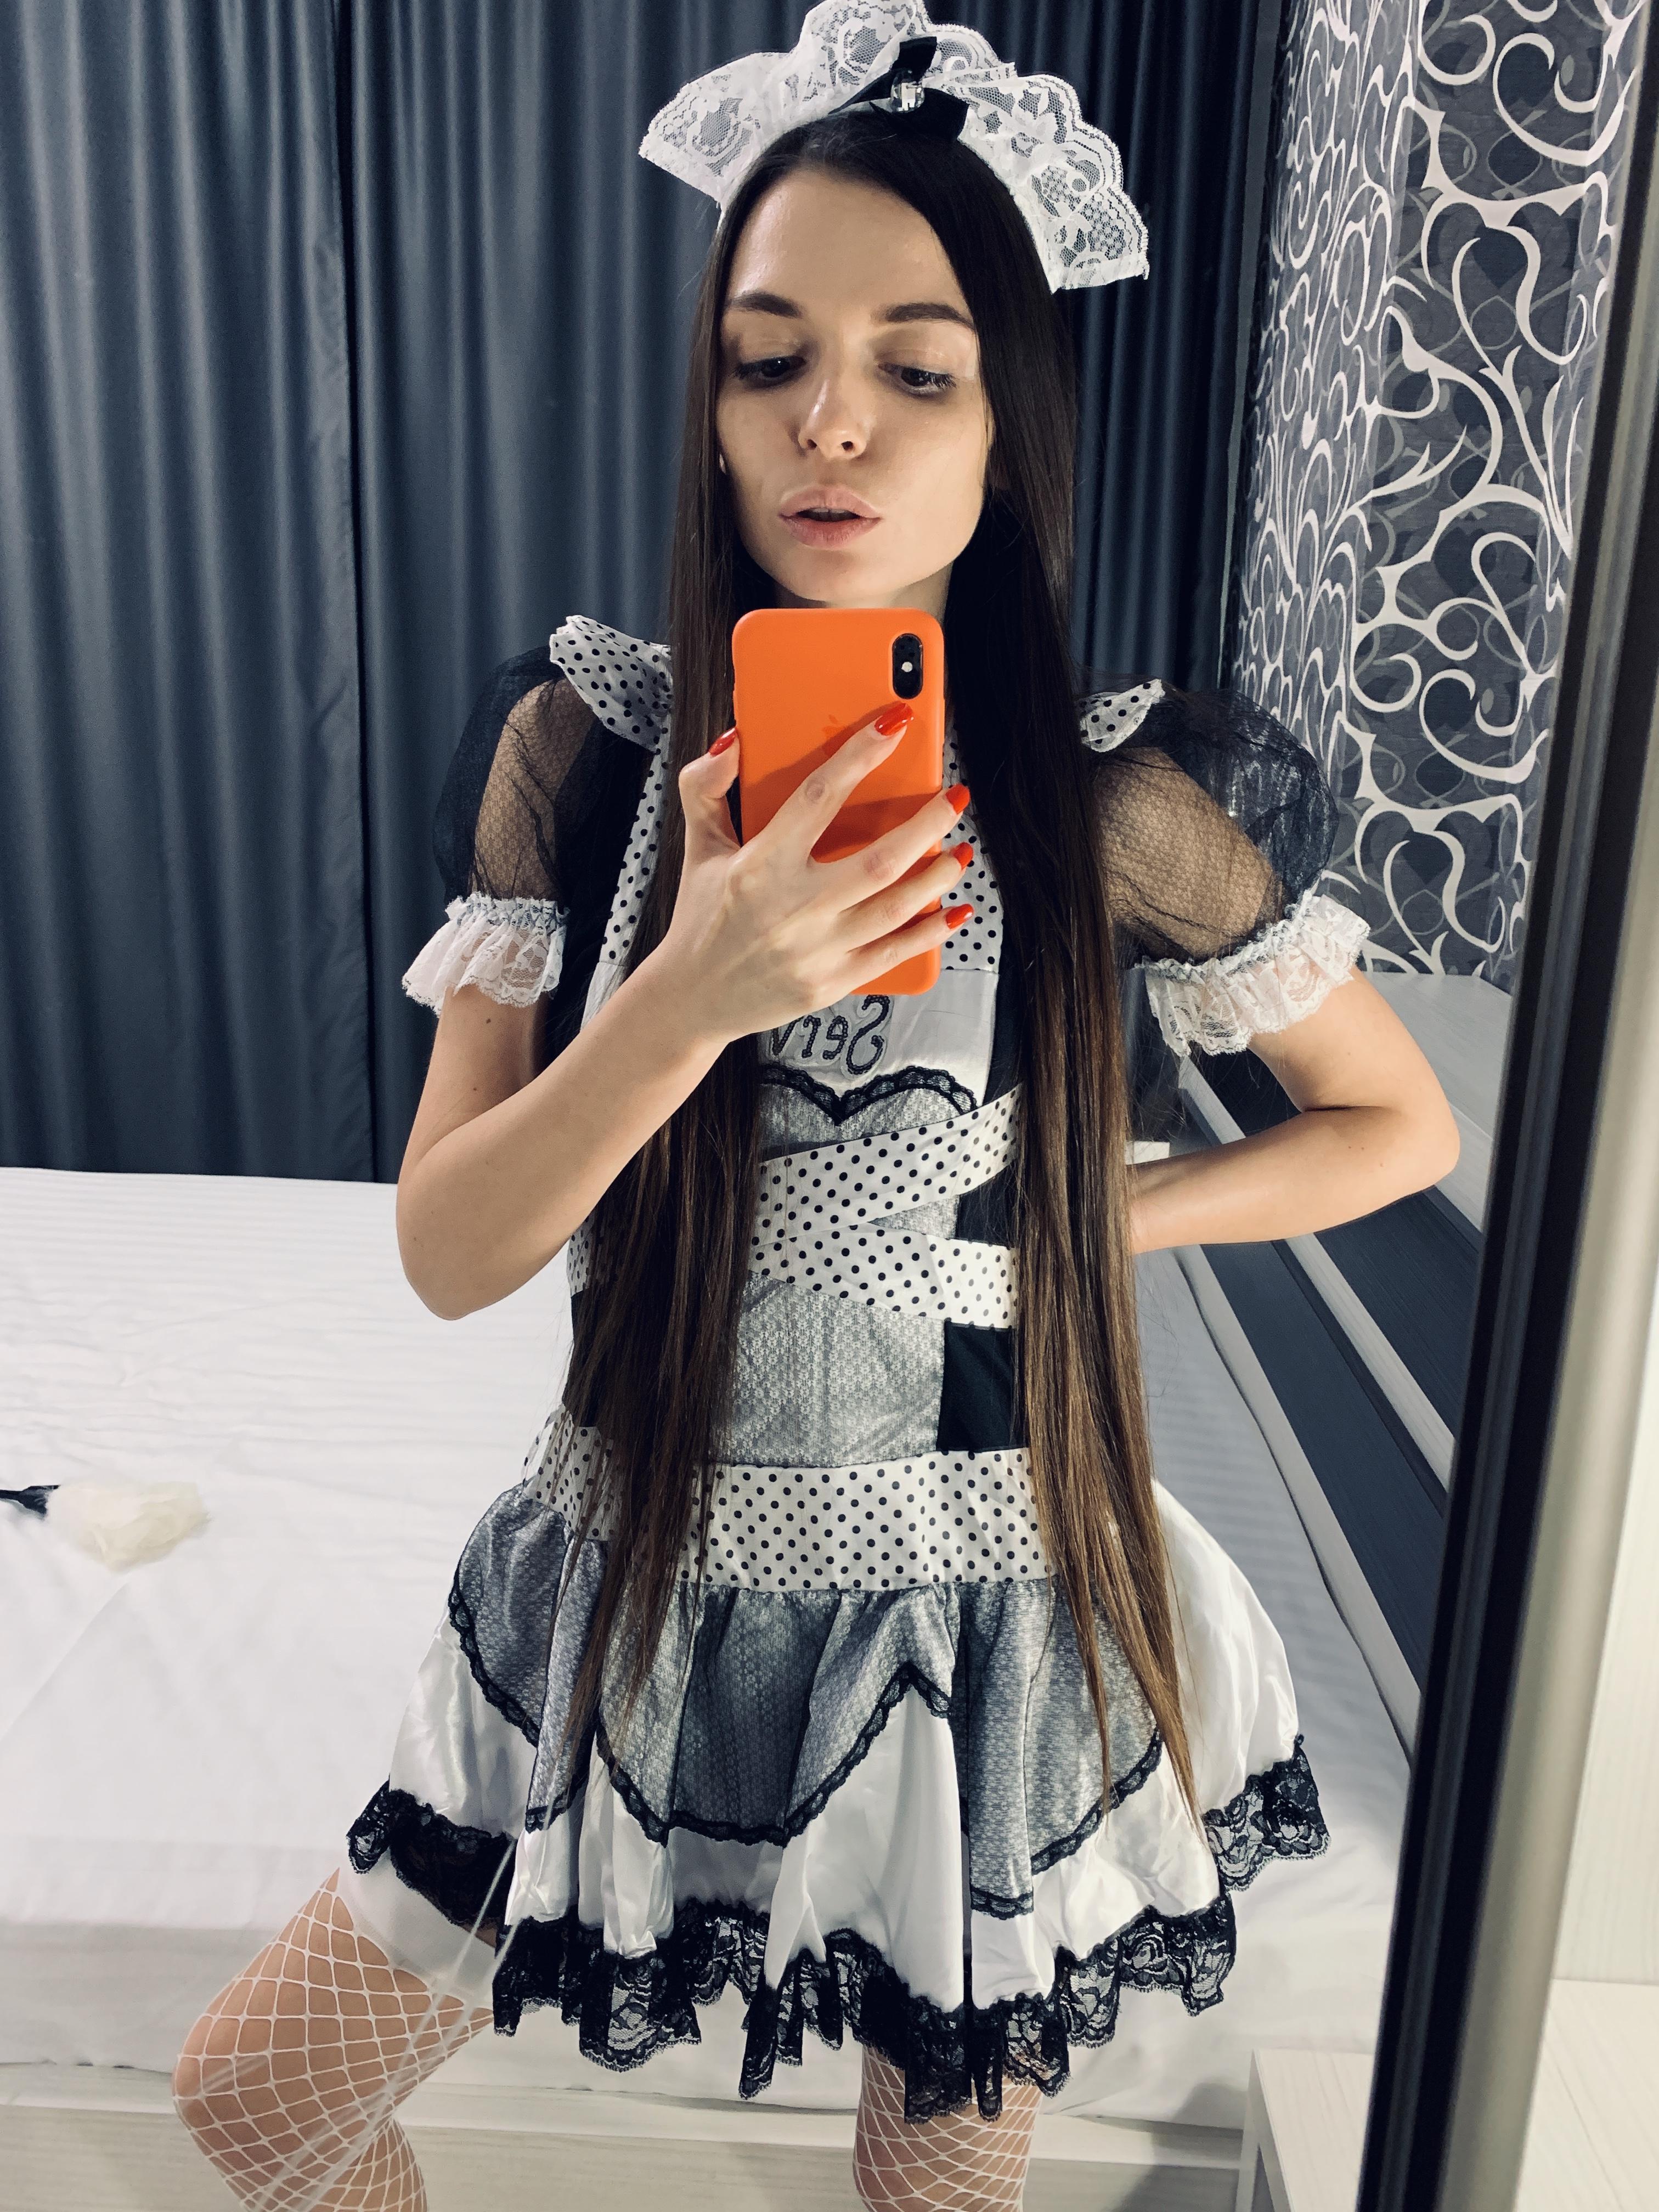 Natalissa